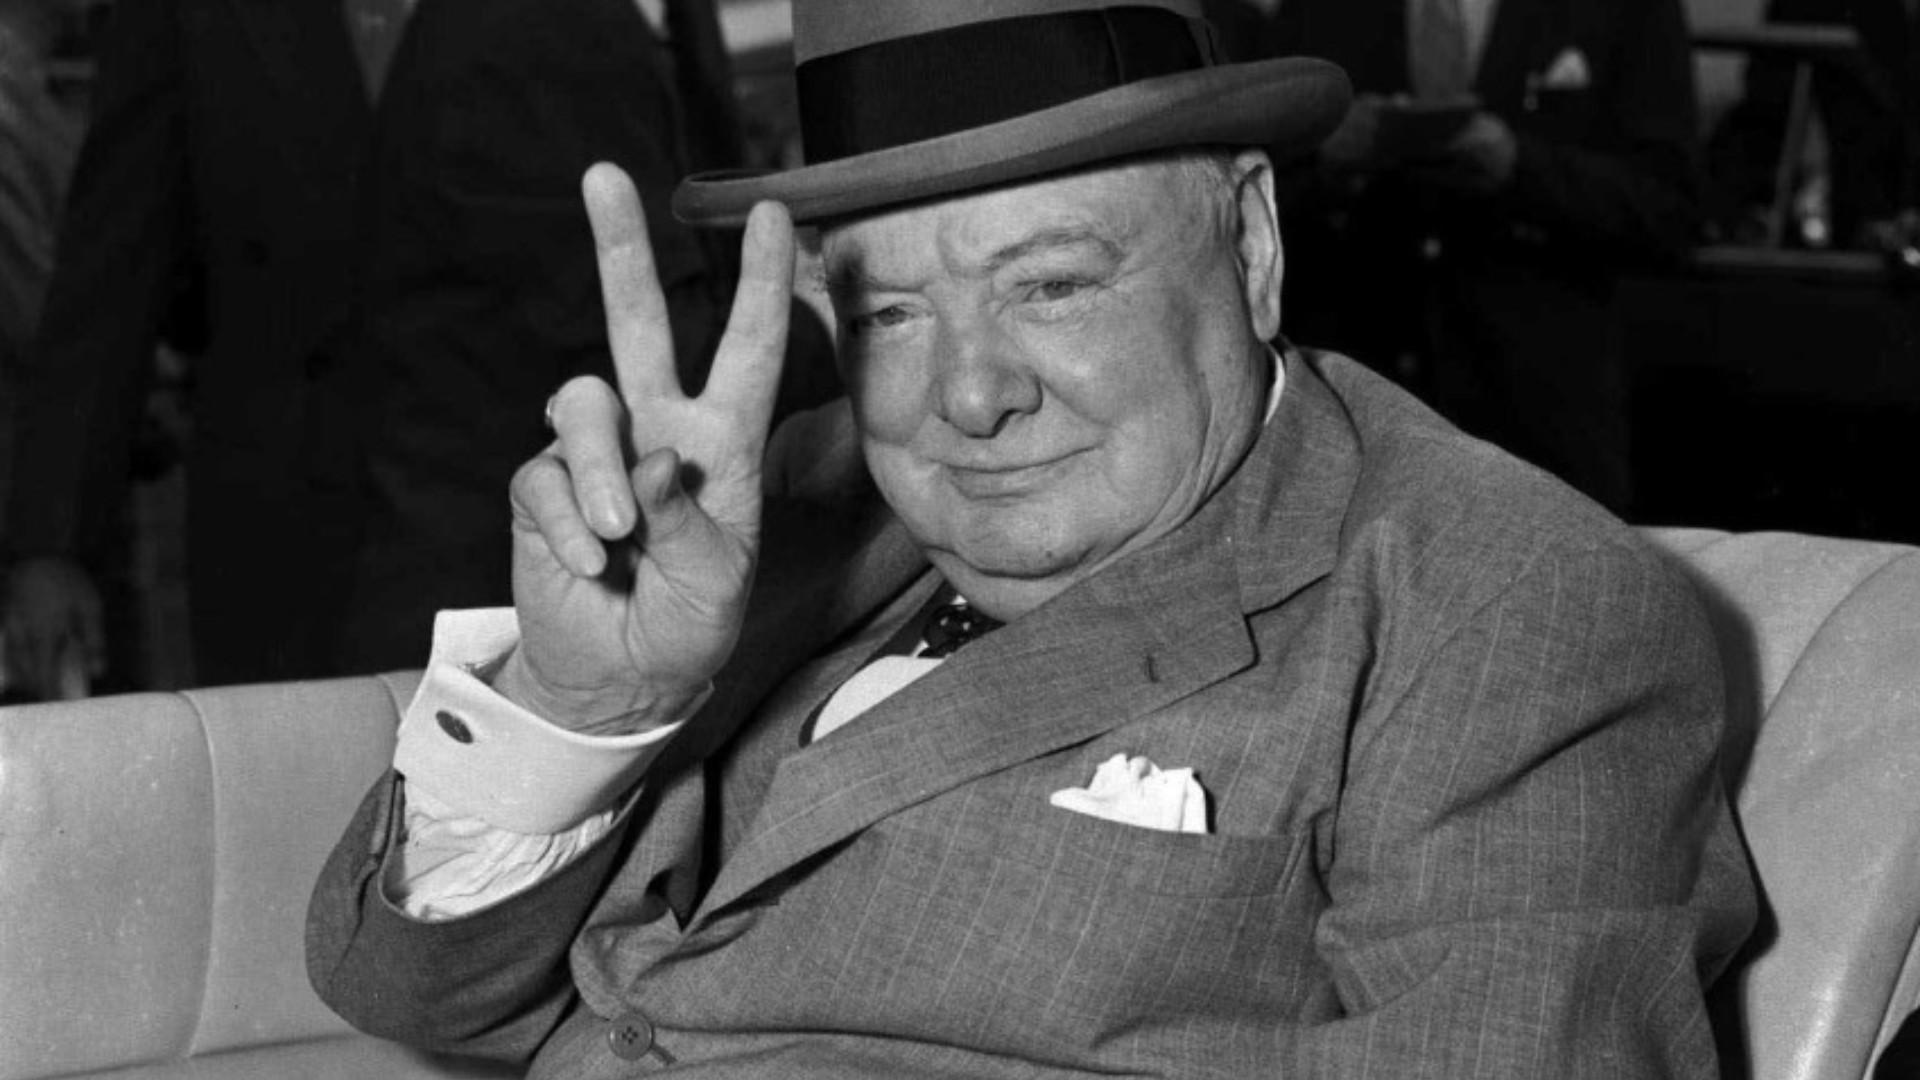 Una estatua para Sir Winston Churchill